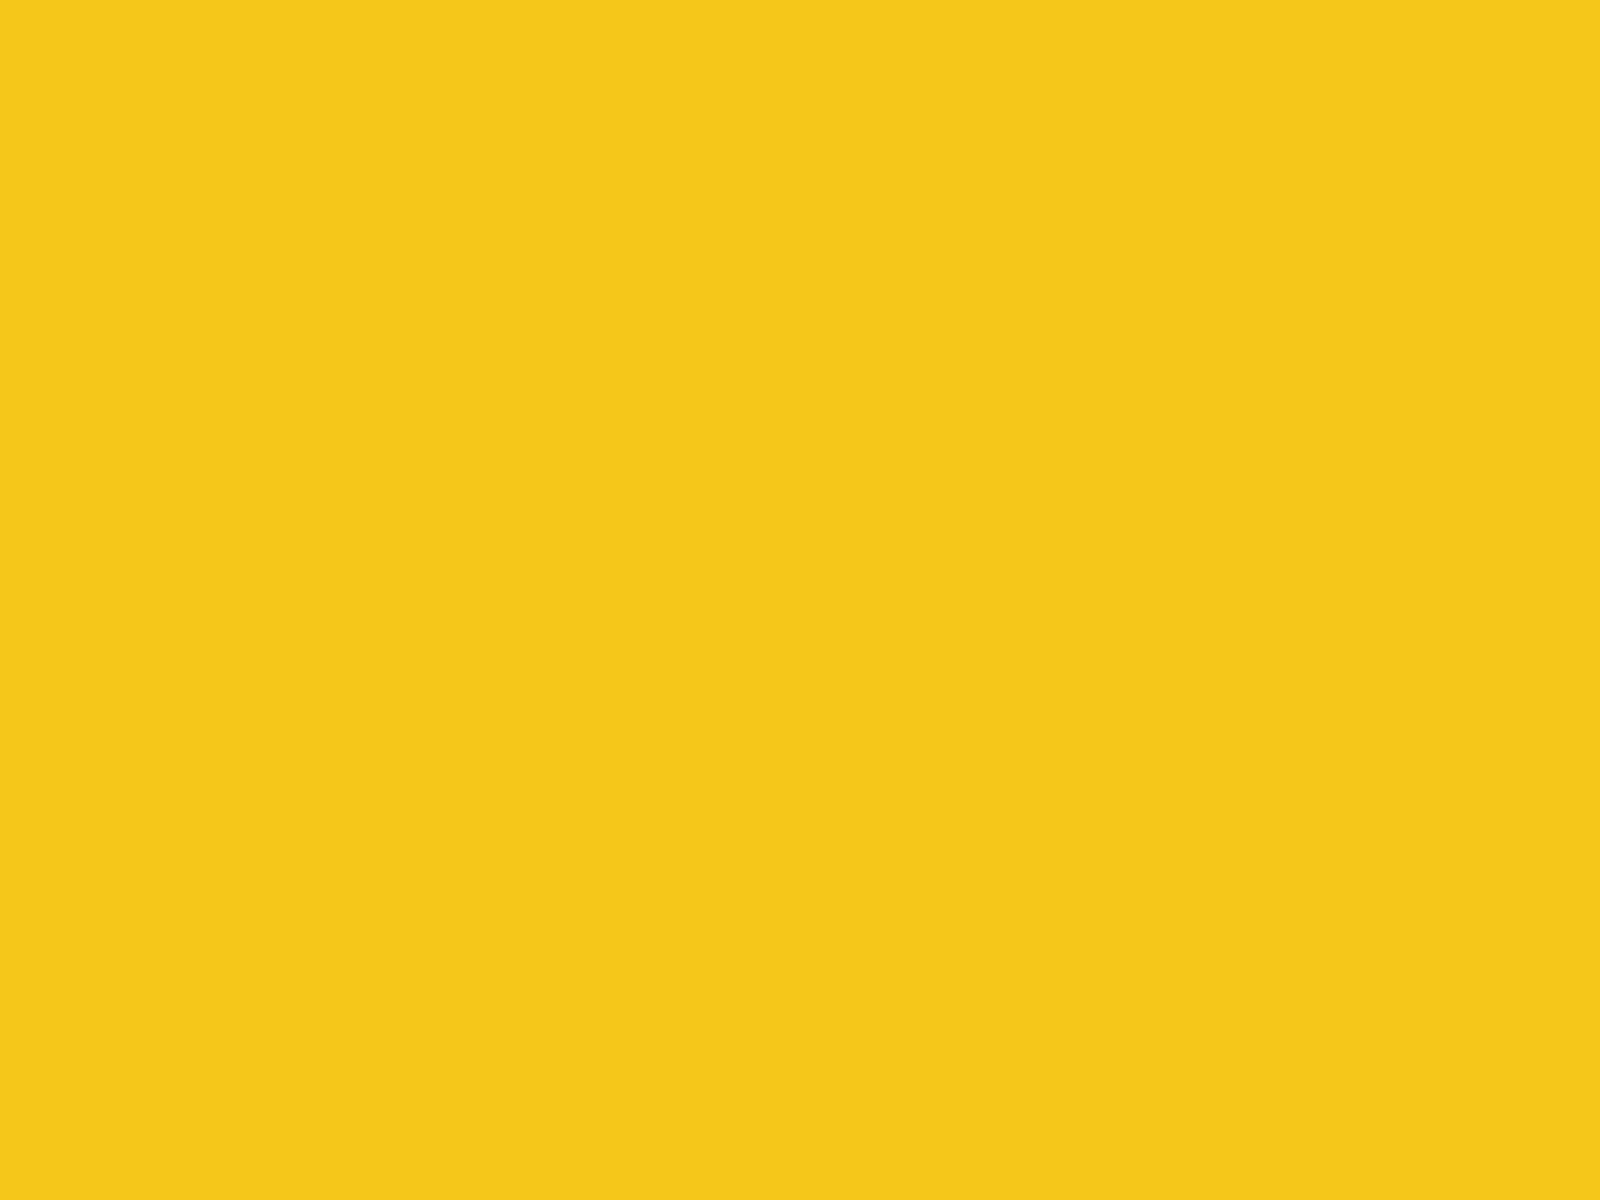 1600x1200 Deep Lemon Solid Color Background